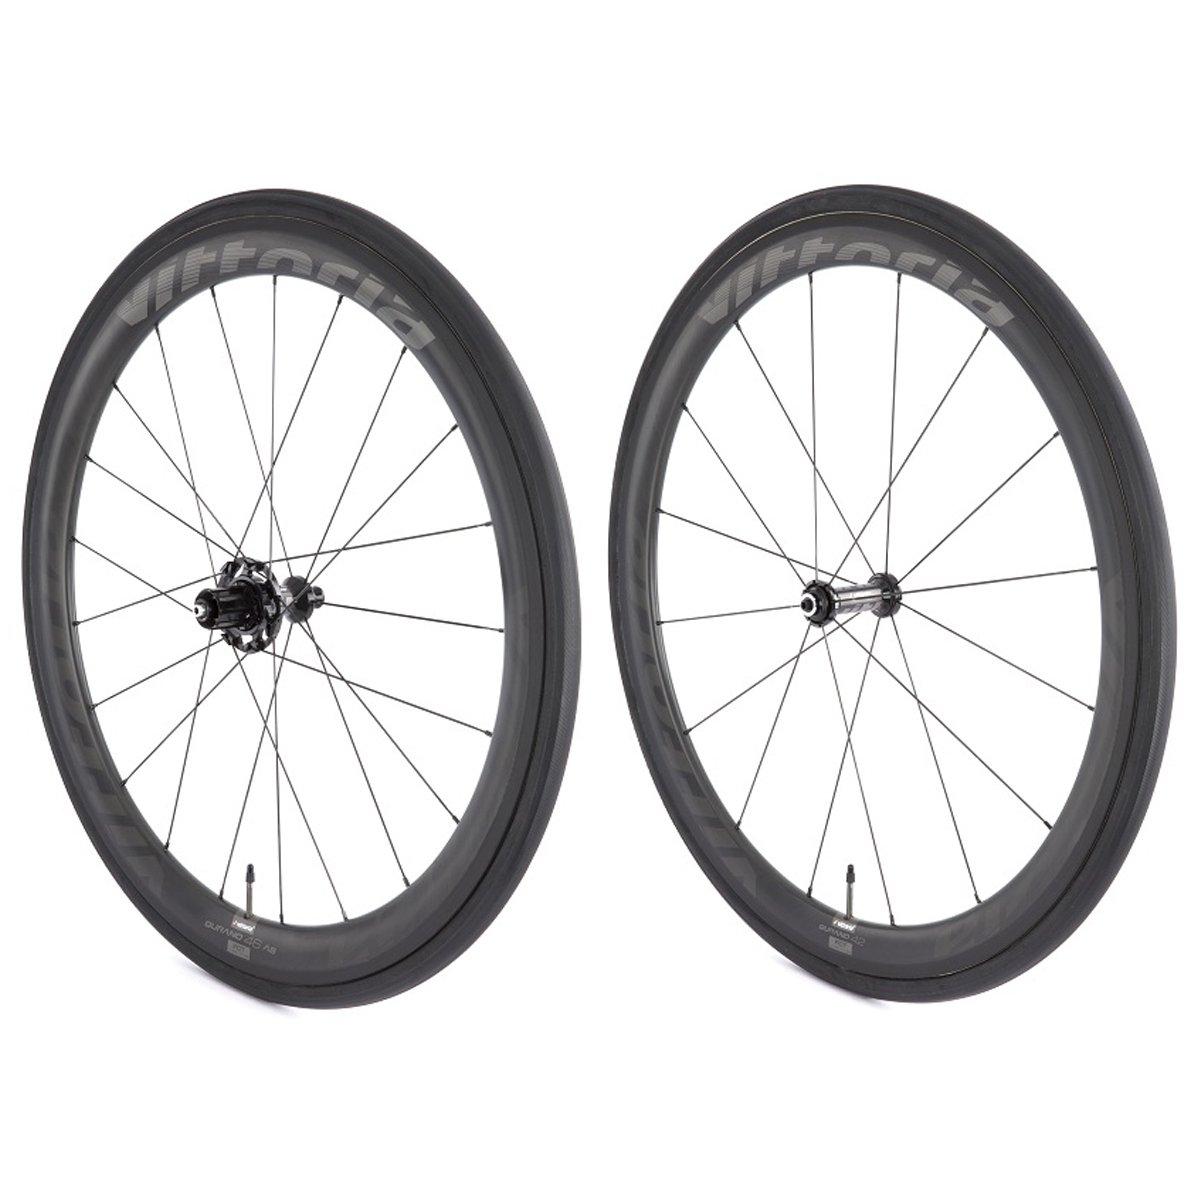 Vittoria Qurano 60カーボンチューブラーロード自転車ホイールセット B00P9DJXQU   700C/ 60mm